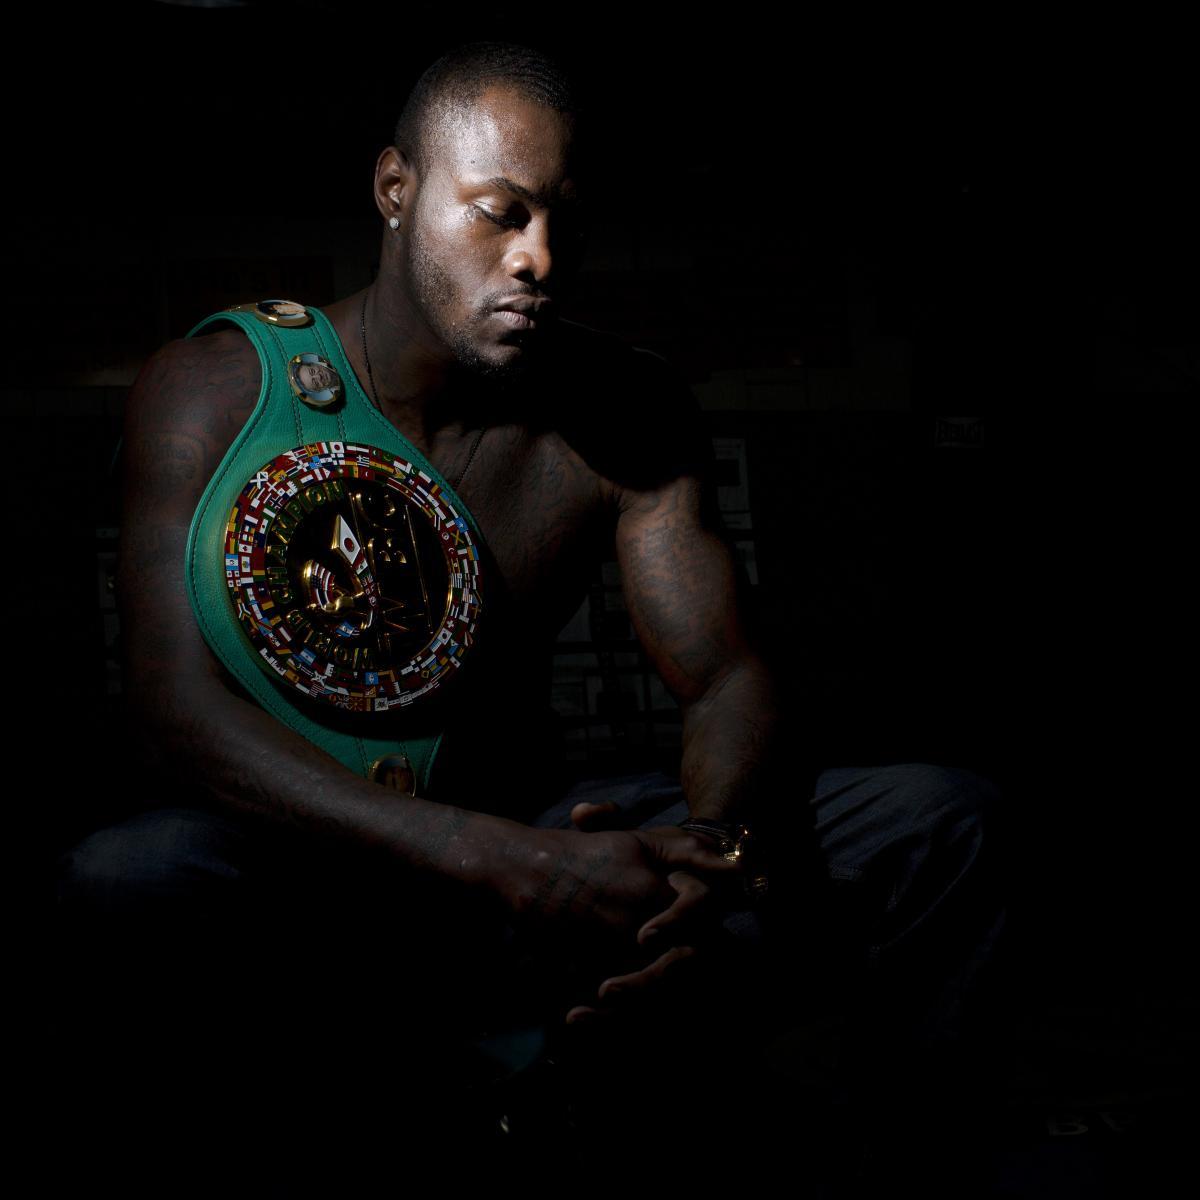 Deontay Wilder's Next Fight: A Mismatch But Ultimately